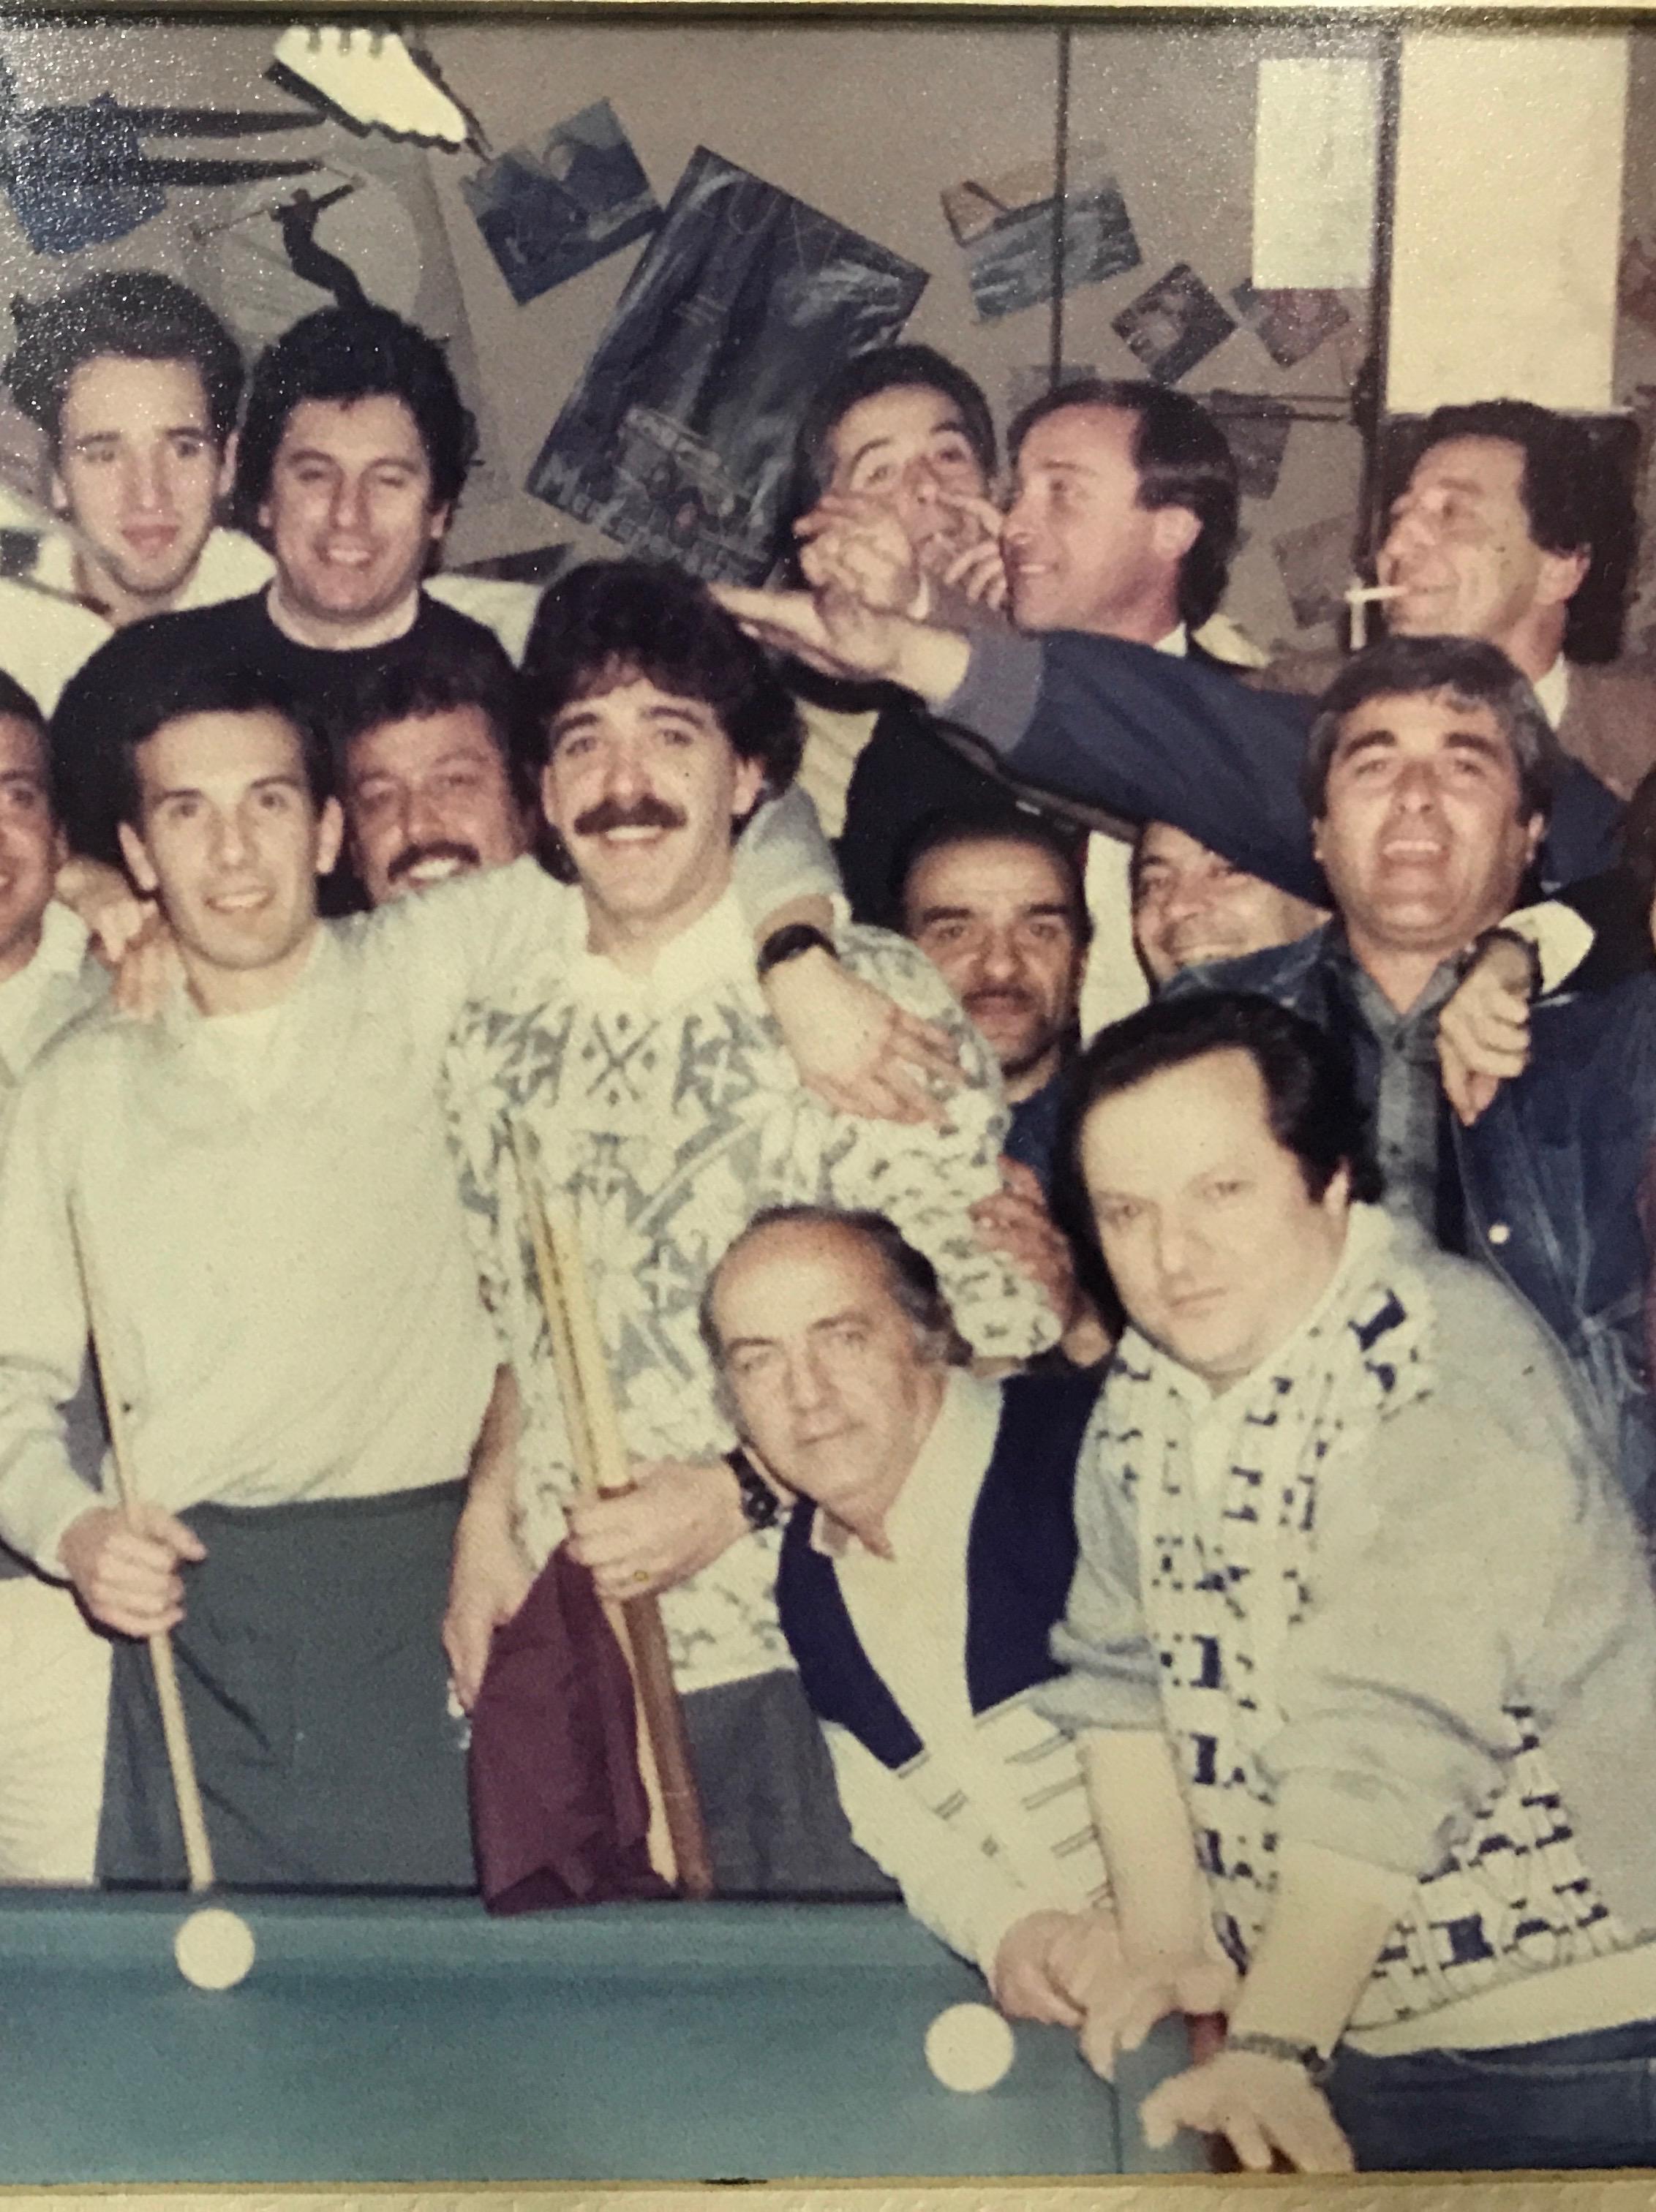 Old photo of the regulars at Café De Garcia.